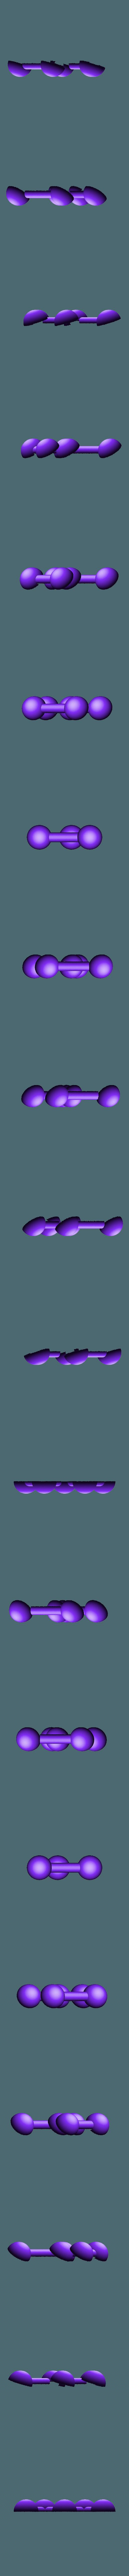 Solid.stl Download free STL file Rede Manchete logo • 3D printer design, CapAwsome